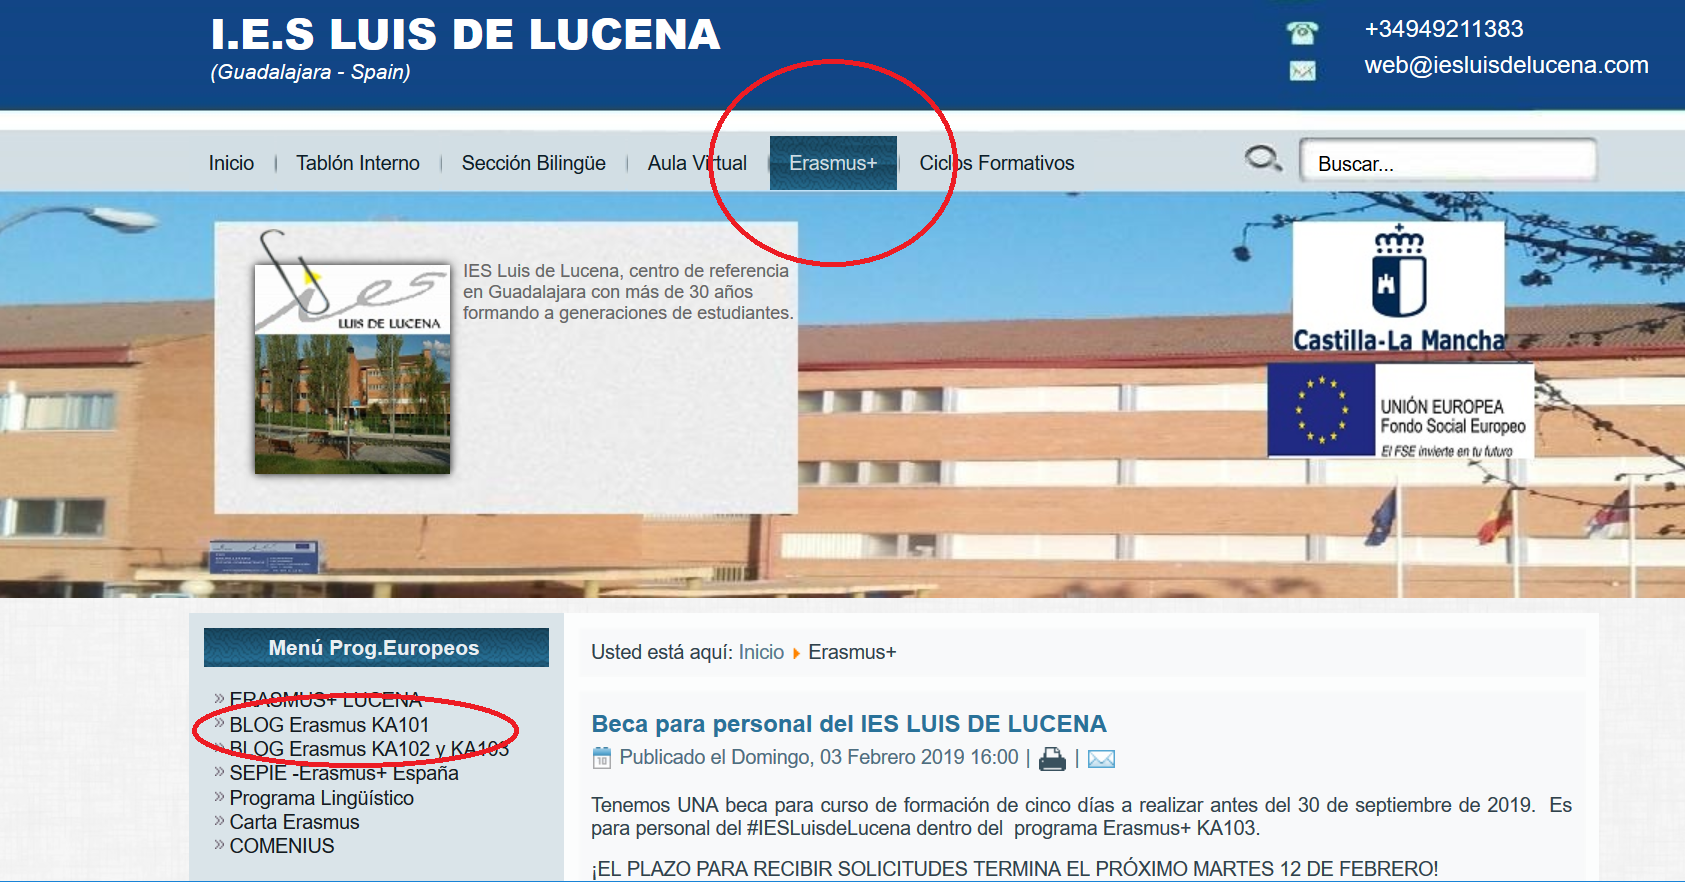 IES LUIS DE LUCENA